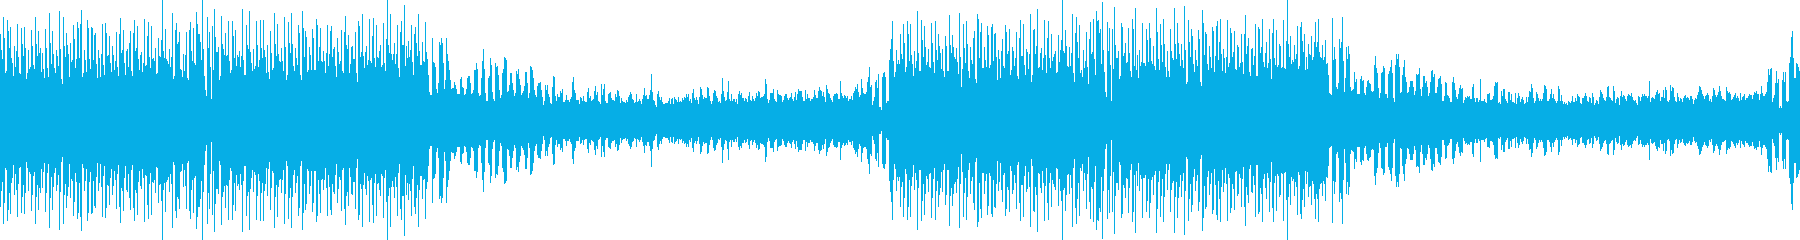 Powerful/Fun/Bright/Sports EDM's reproduced waveform